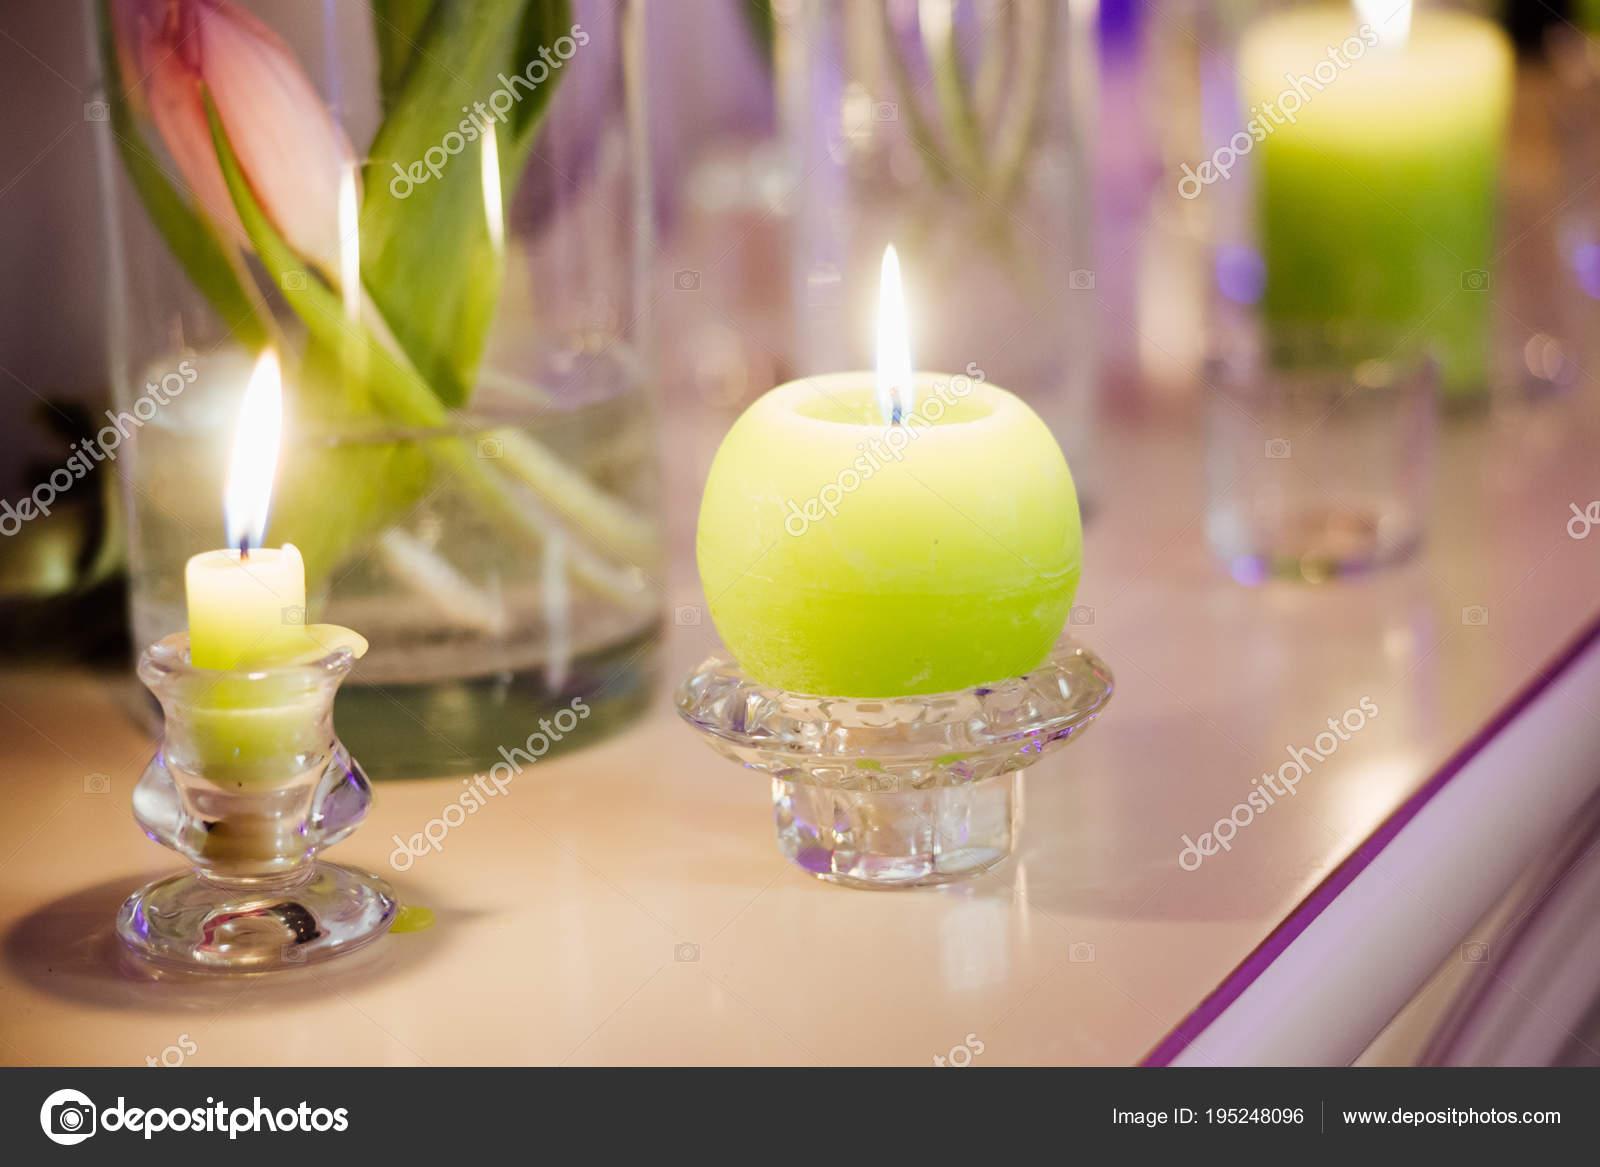 Detailni Foto Krasne Svatebni Dekorace Kvetinami Zelene Svicky Stole